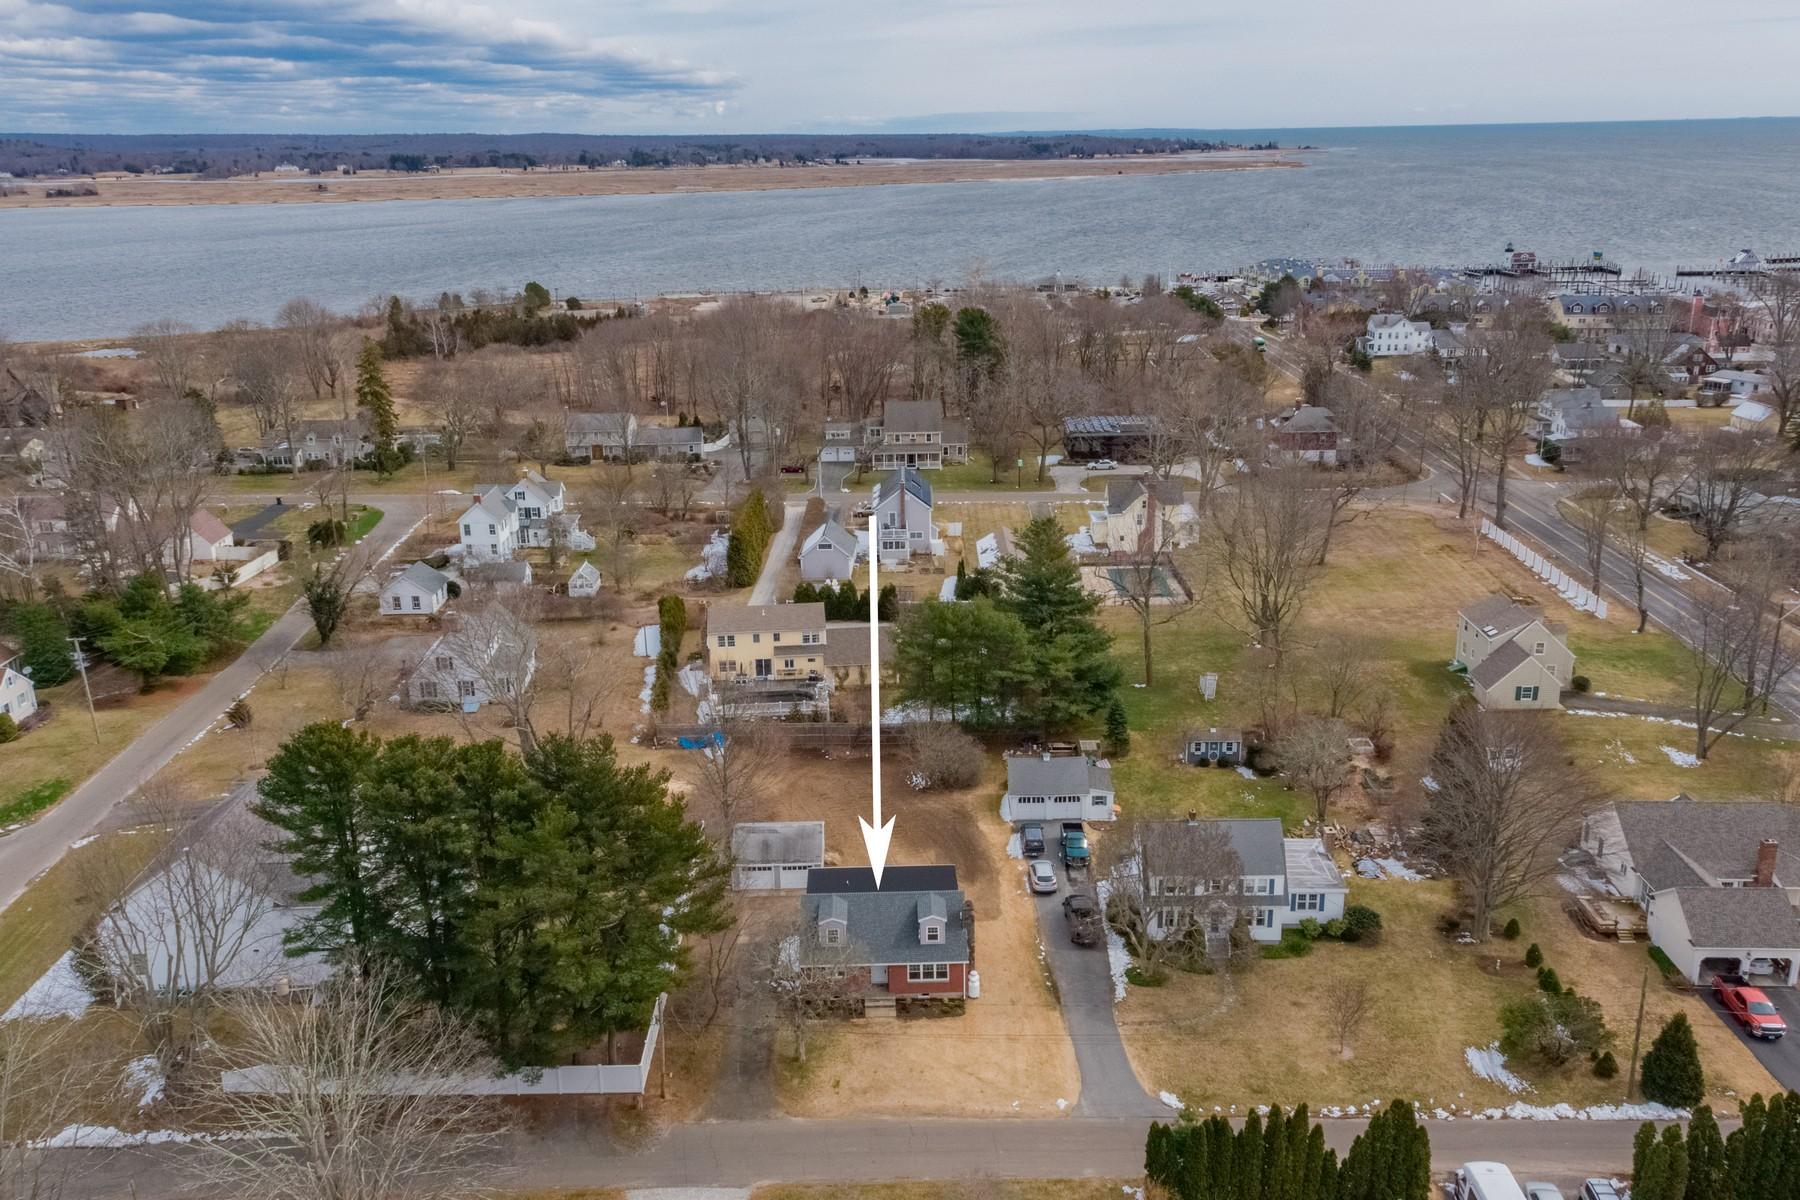 独户住宅 为 销售 在 Completely Remodeled Cape in North Cove 10 Ward Place, 旧赛布鲁克, 康涅狄格州, 06475 美国